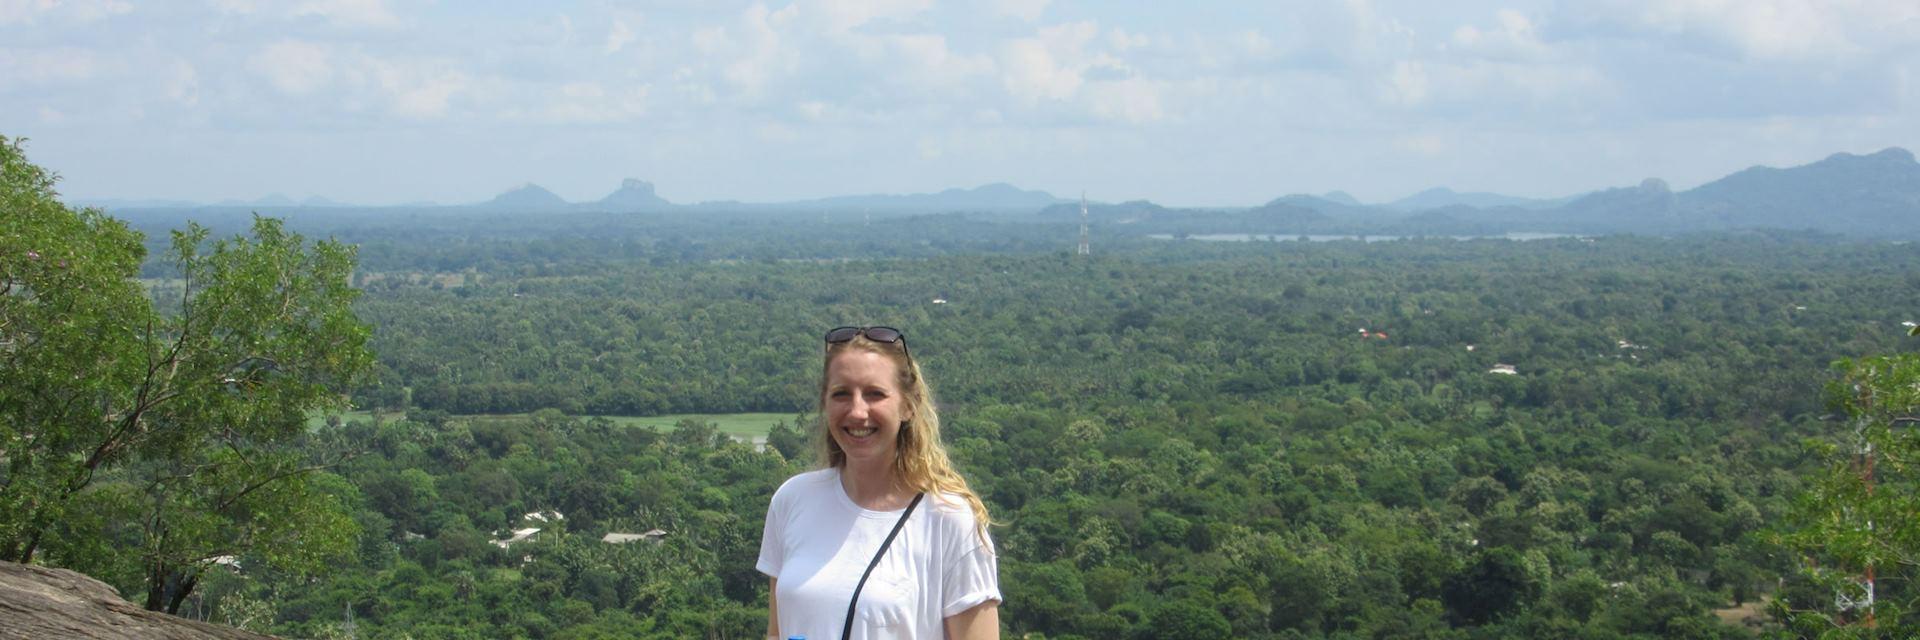 Heather at Dambulla Caves, Sri Lanka